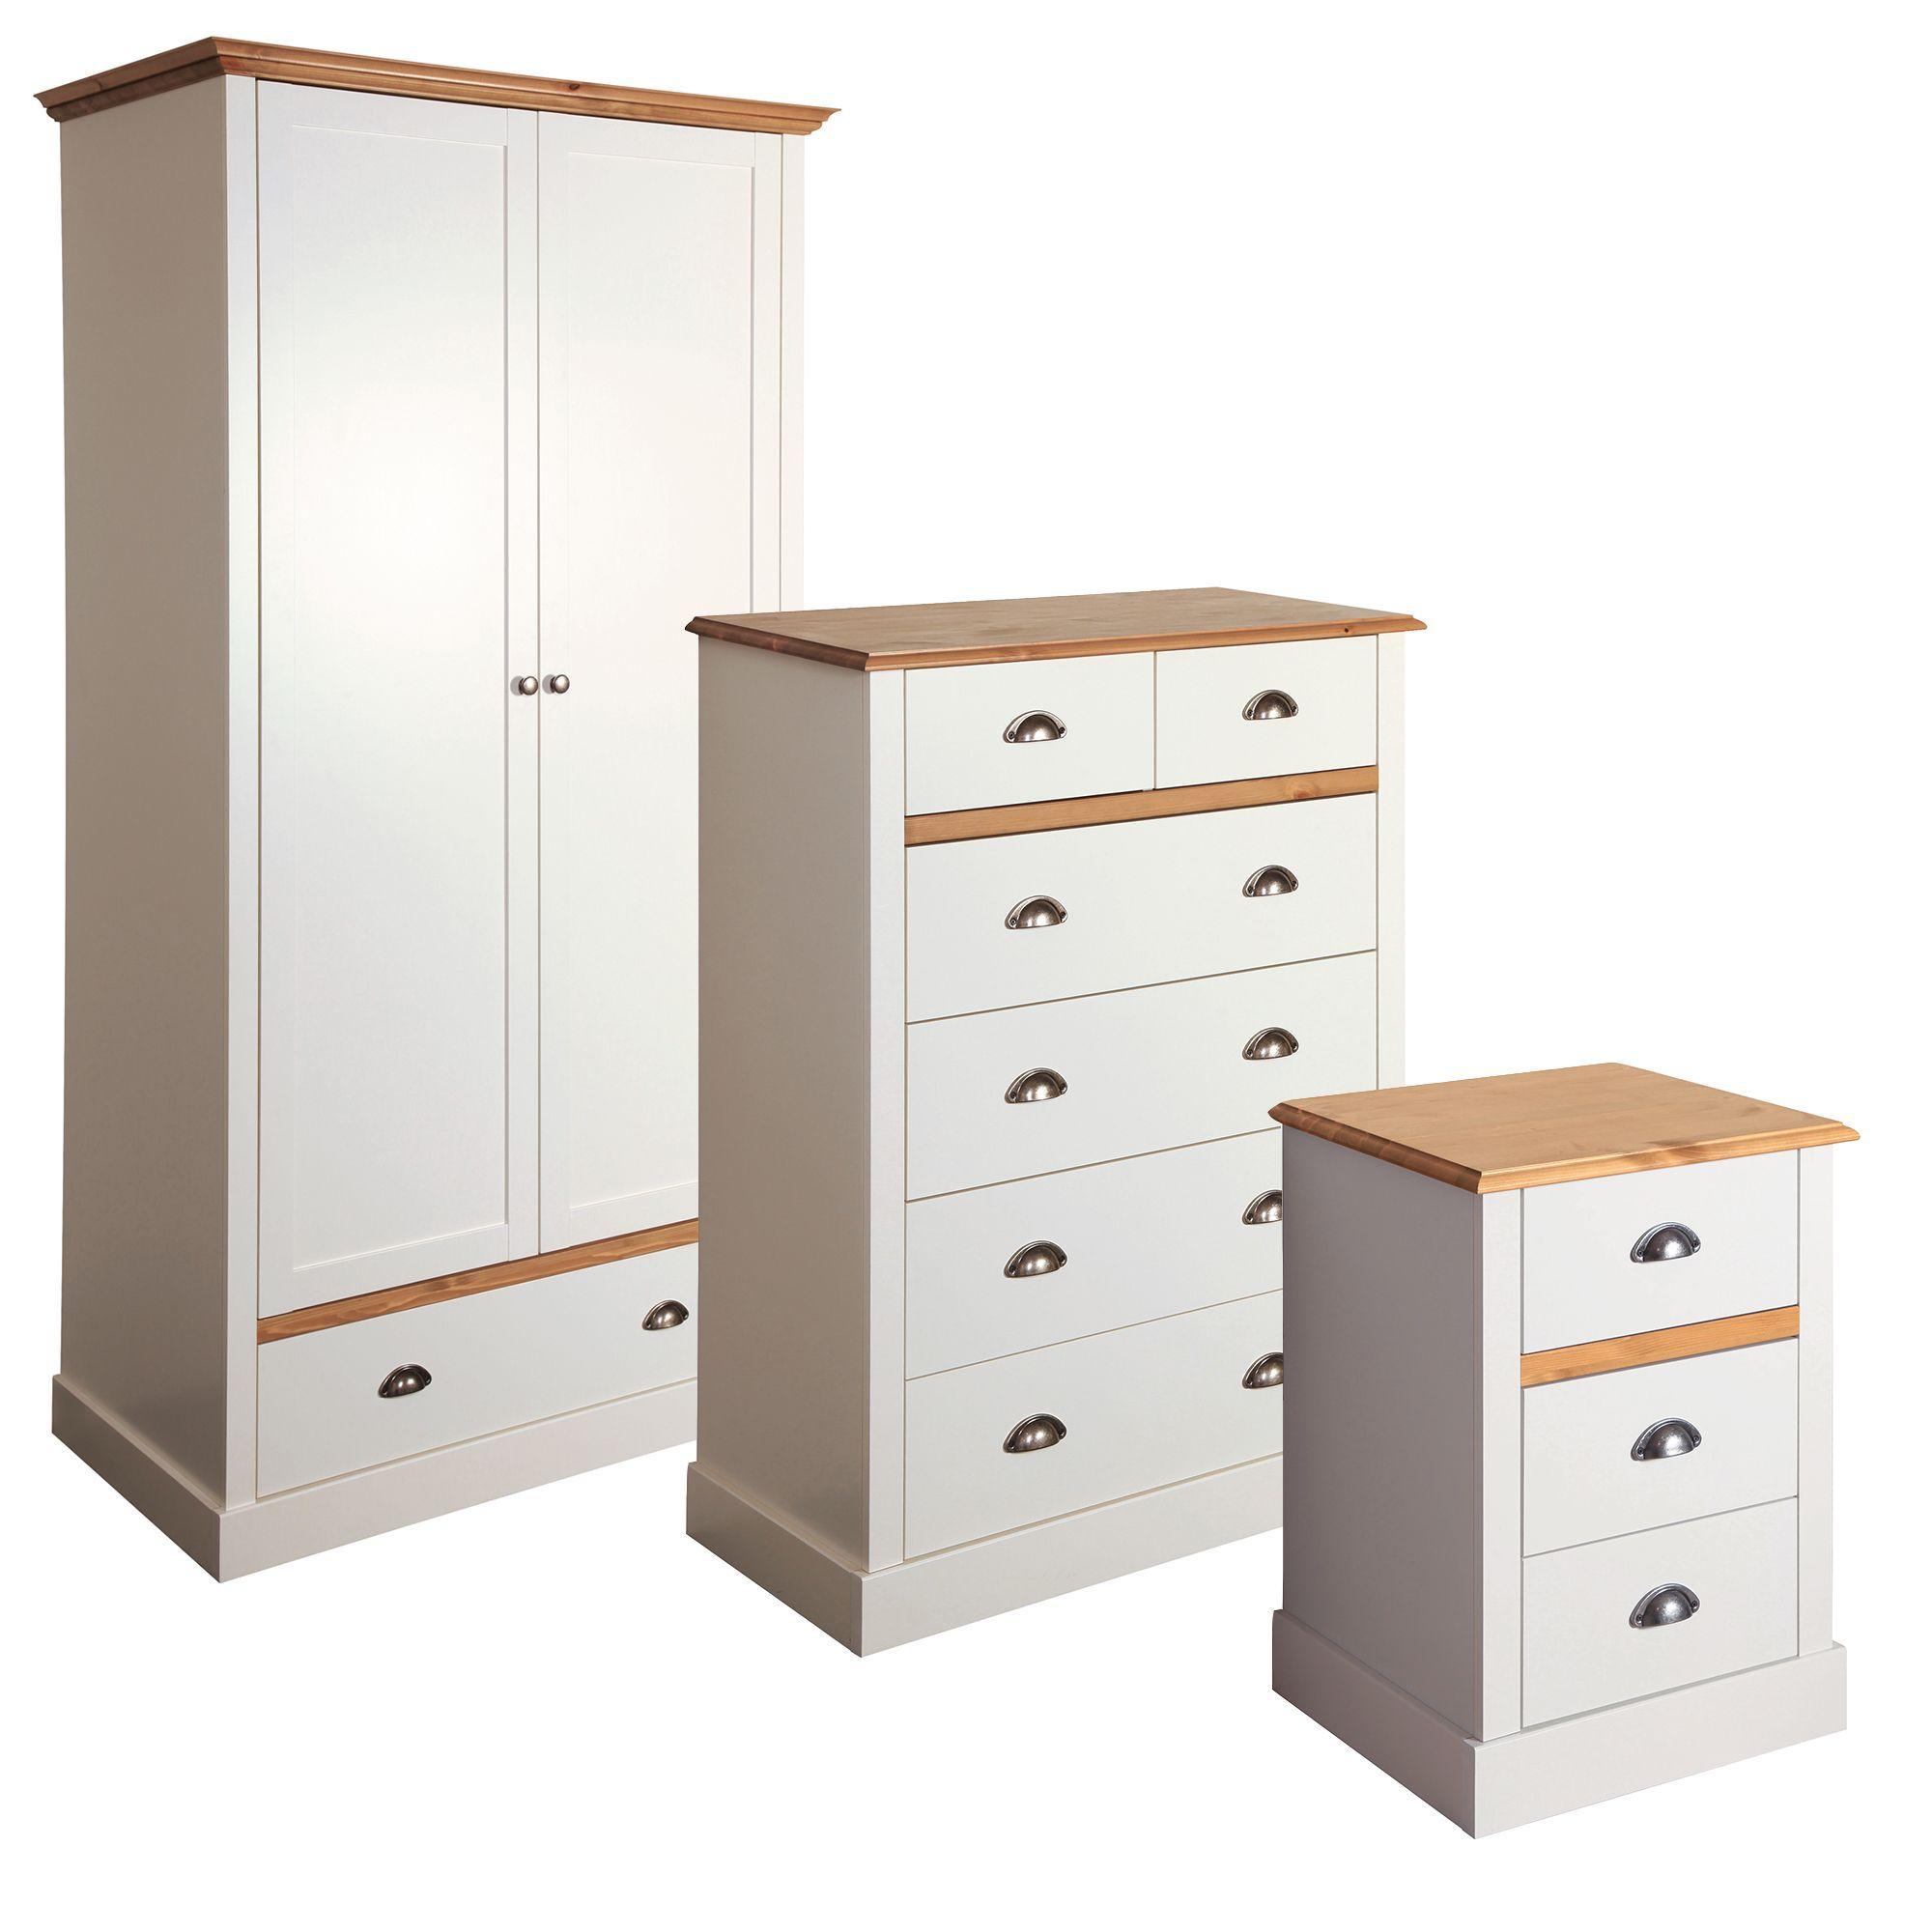 3 Piece Bedroom Sets | Bedroom Furniture | DIY at B&Q